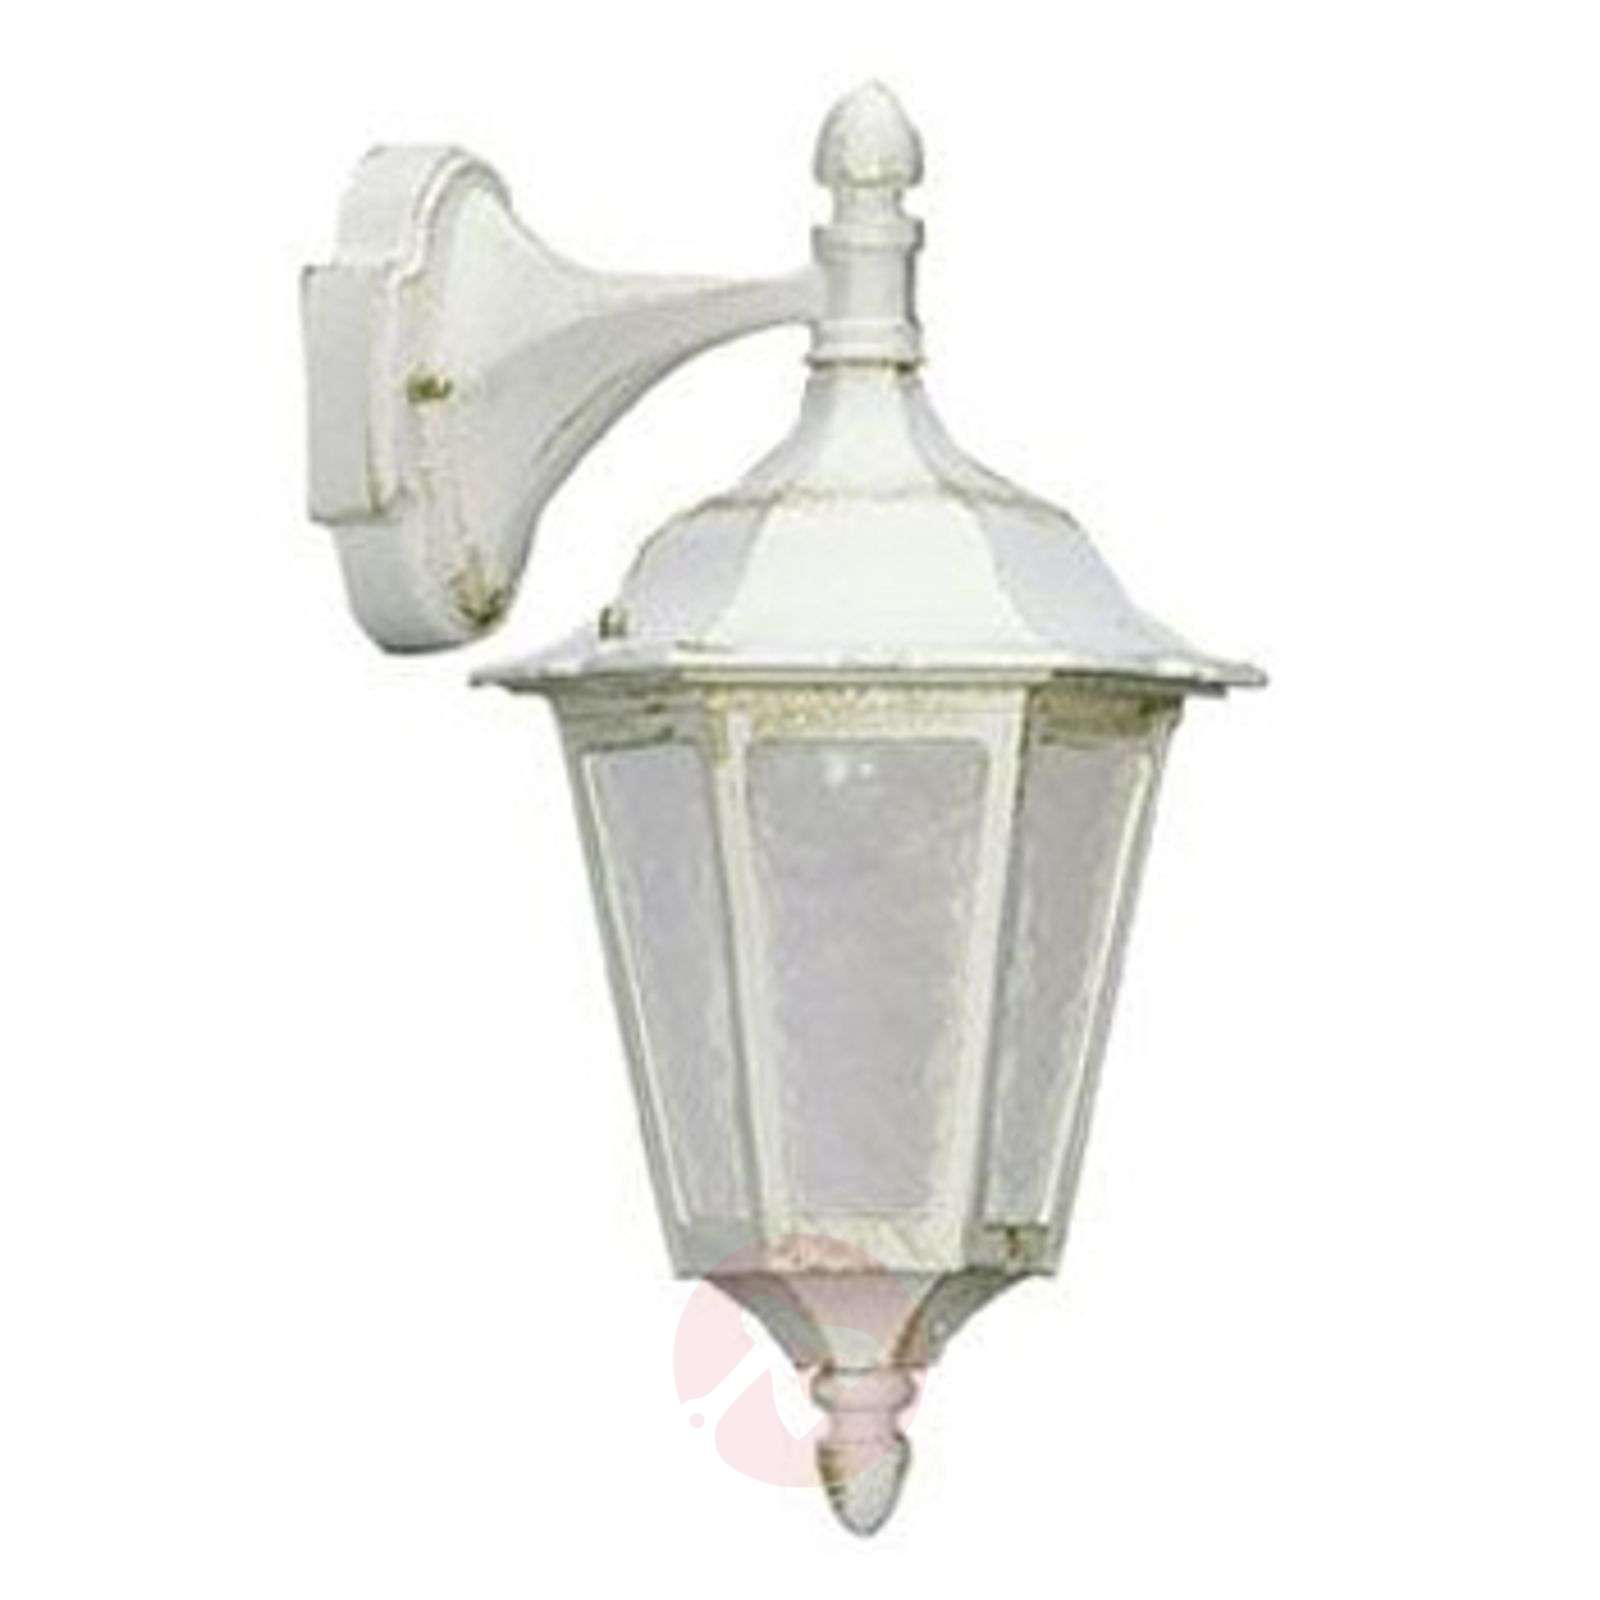 Stylish outdoor wall light 1819-4001728X-01